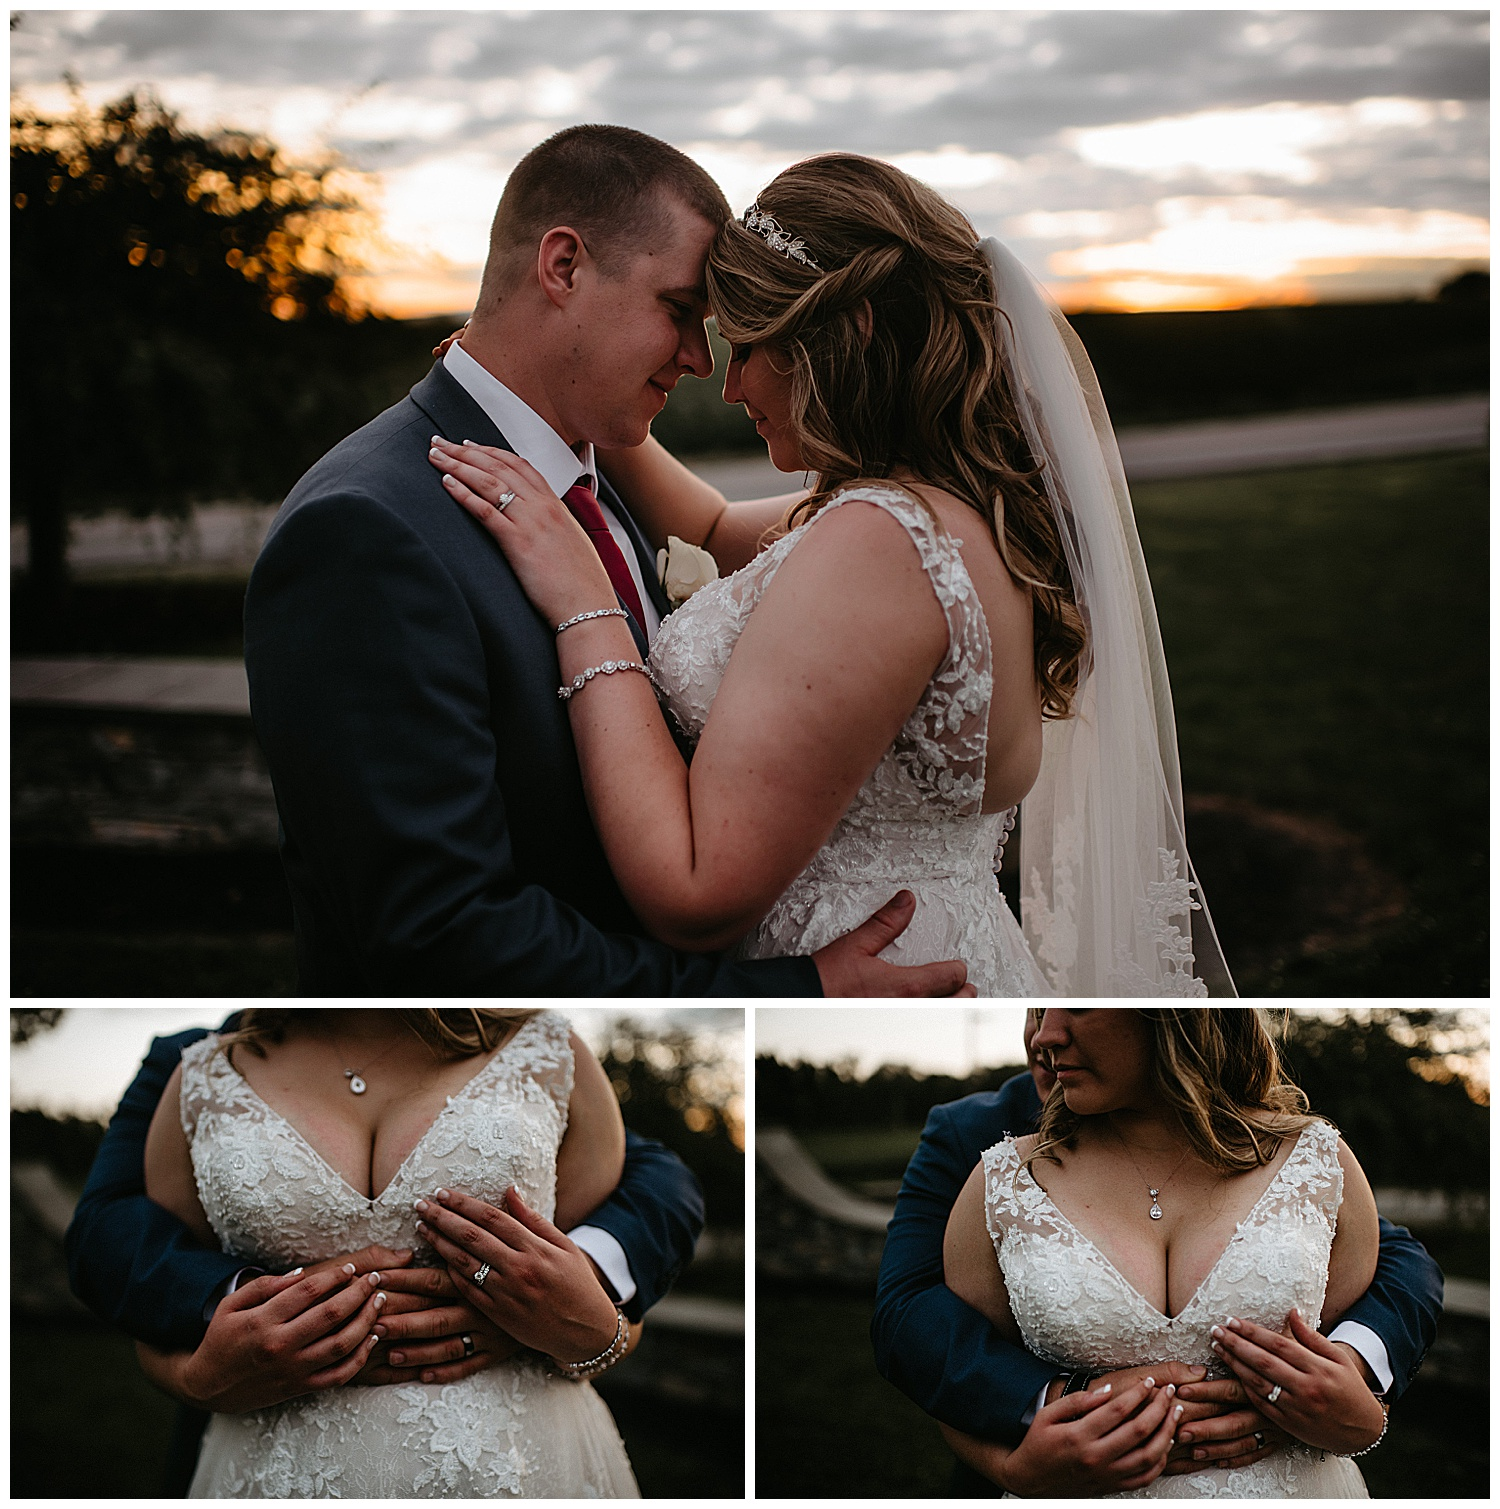 NEPA-Bloomgsburg-Wedding-Photographer-at-The-Barn-at-Greystone-Farms-Watsontown-PA_0109.jpg